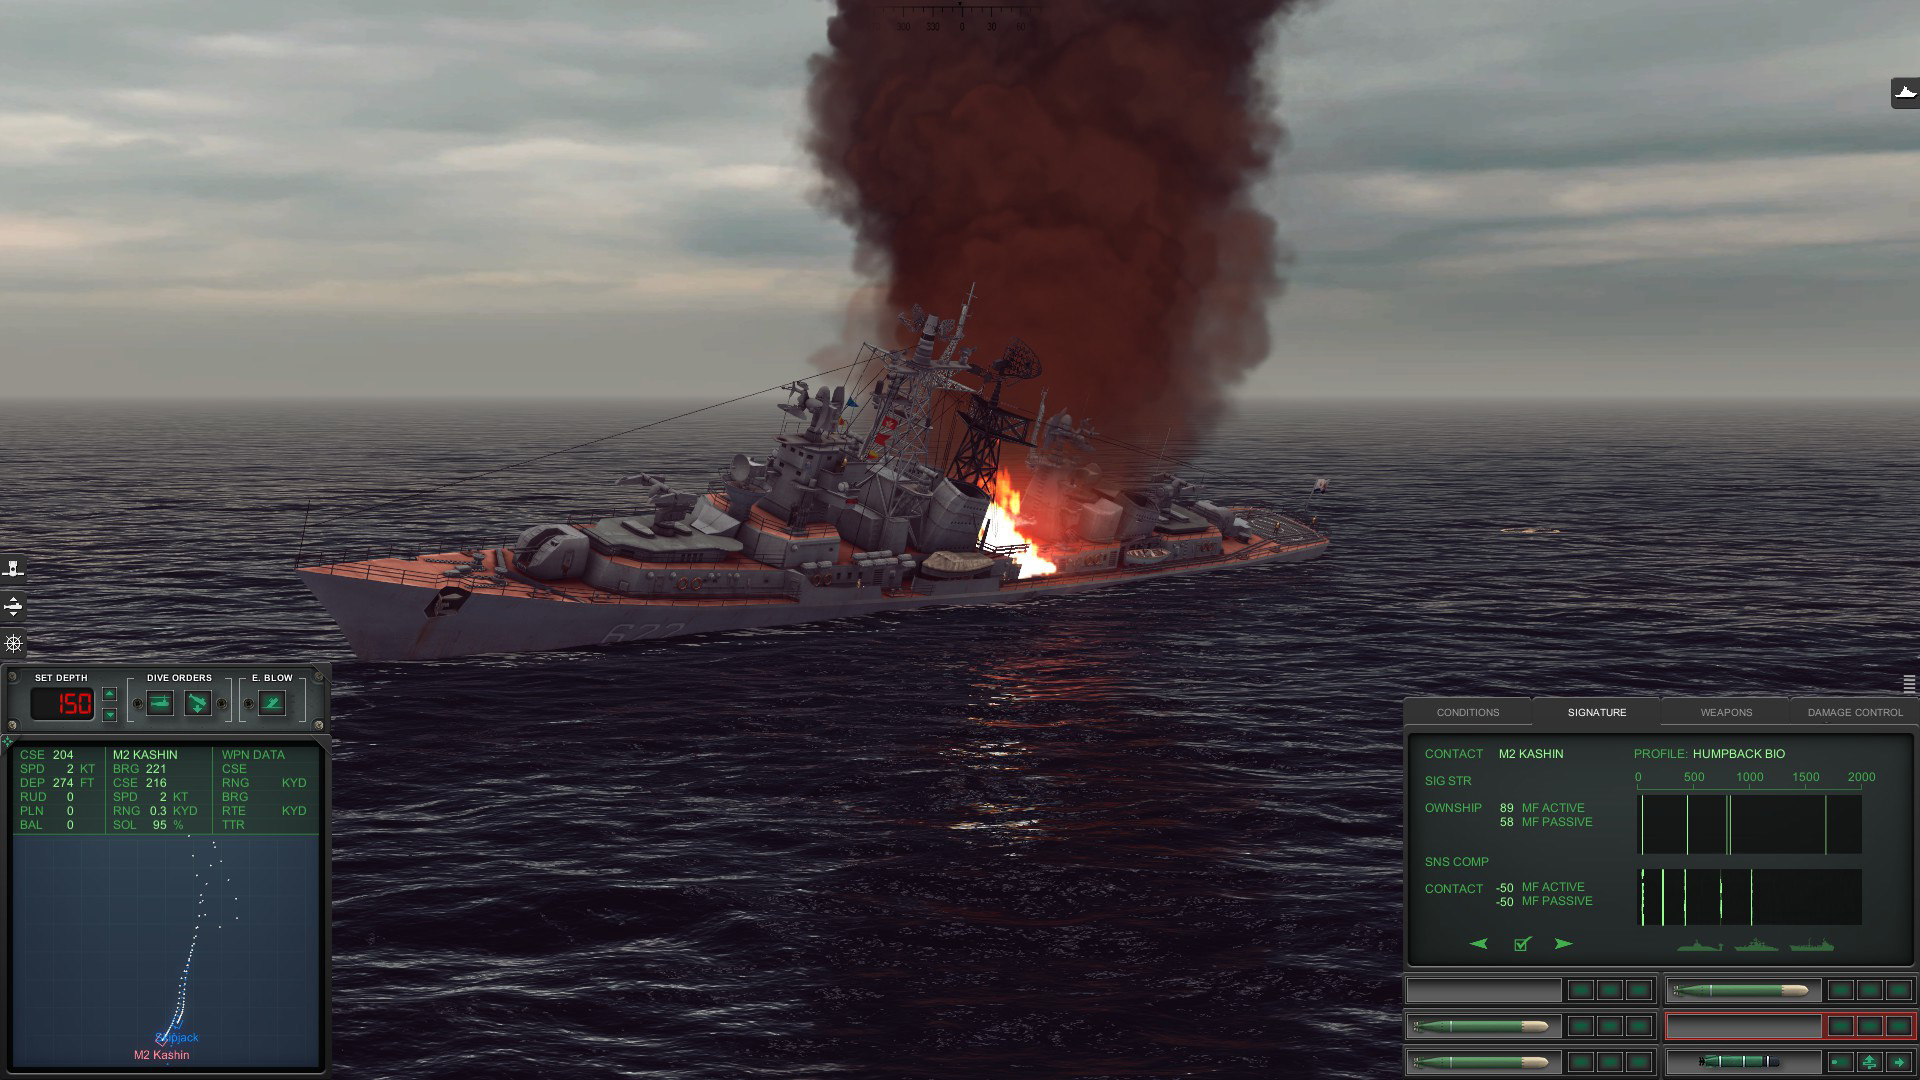 Cold Waters Screenshot 3